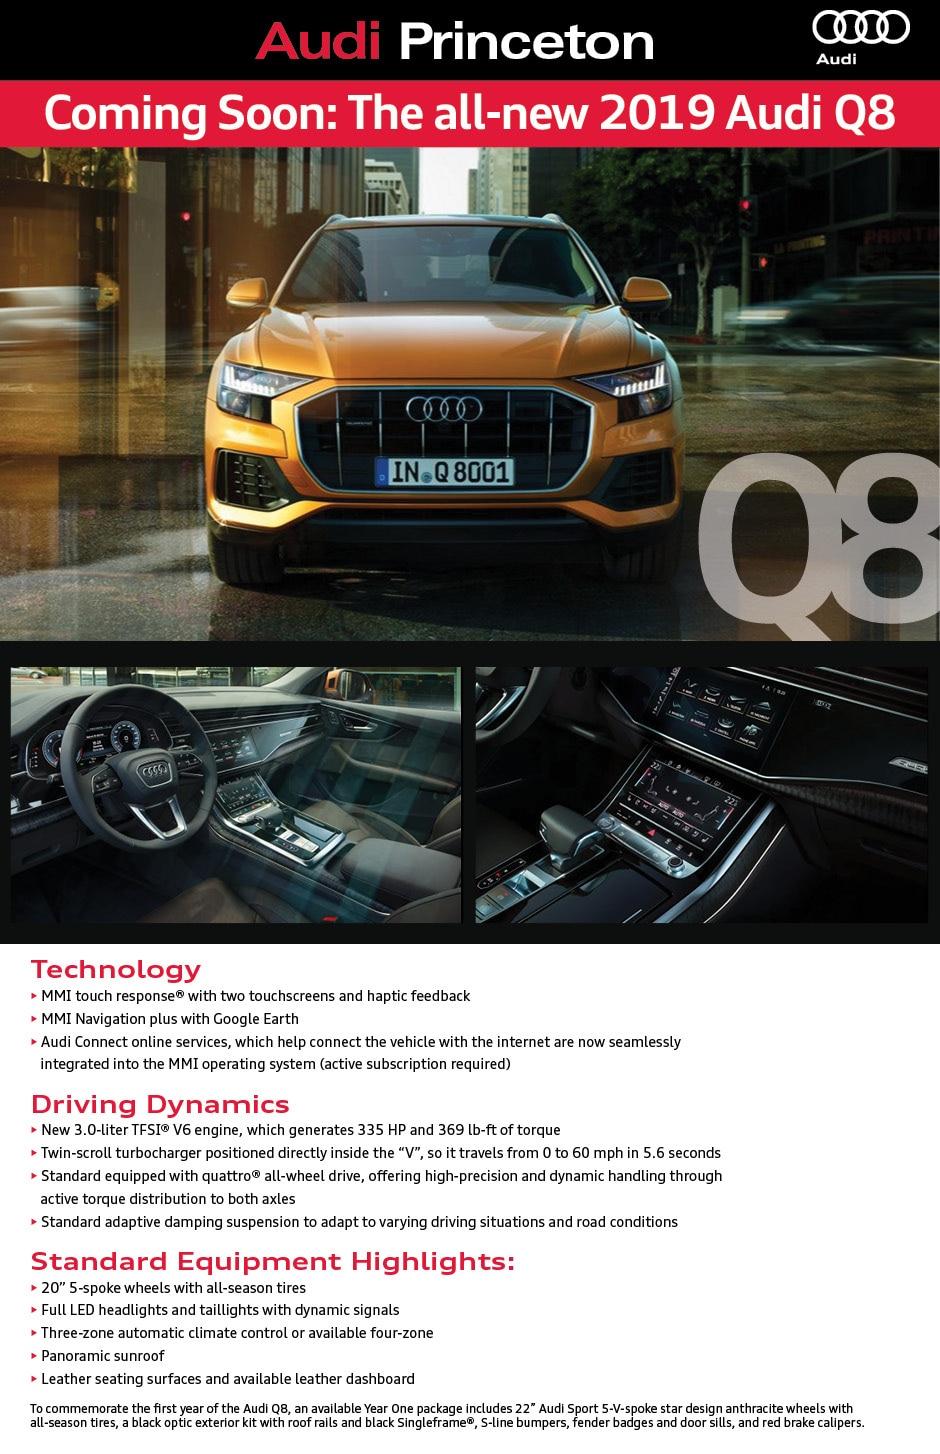 Audi Q7 Headlight Wiring Harness Schematic Diagram Electronic Princeton New Dealership In Nj 08540rhaudiprinceton At Selfit